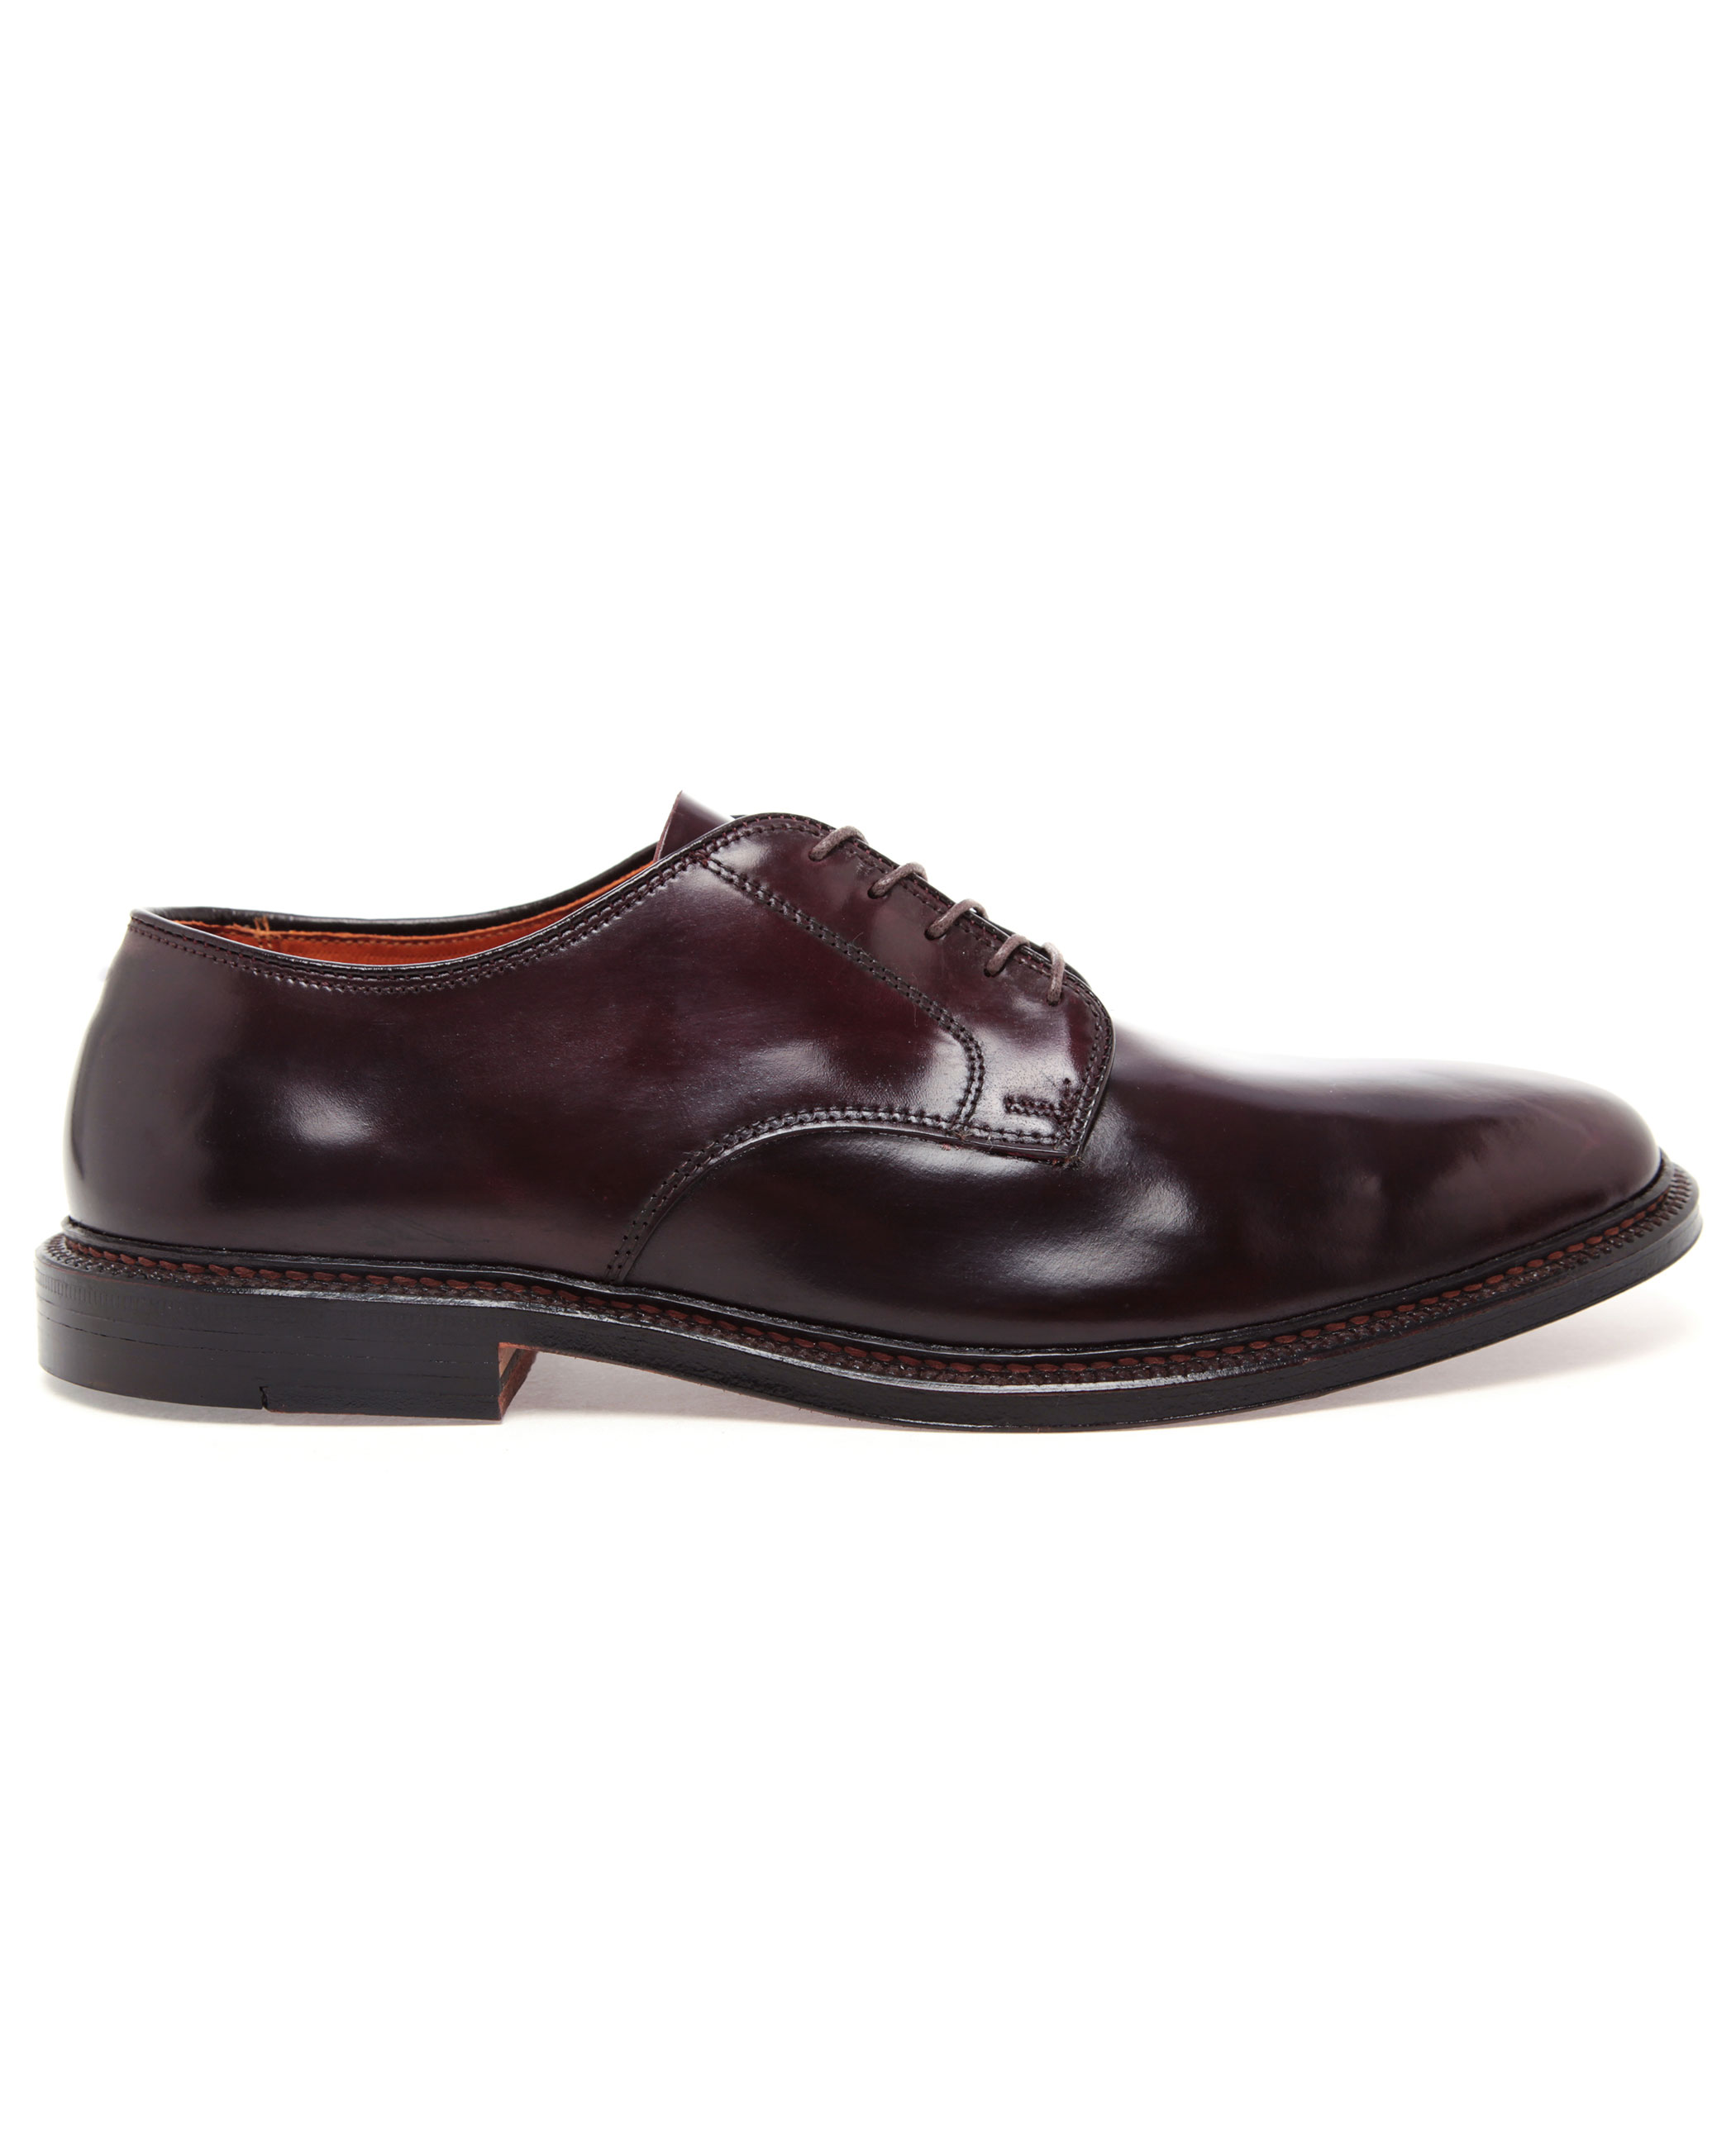 Oxblood Stacked Heel Shoes